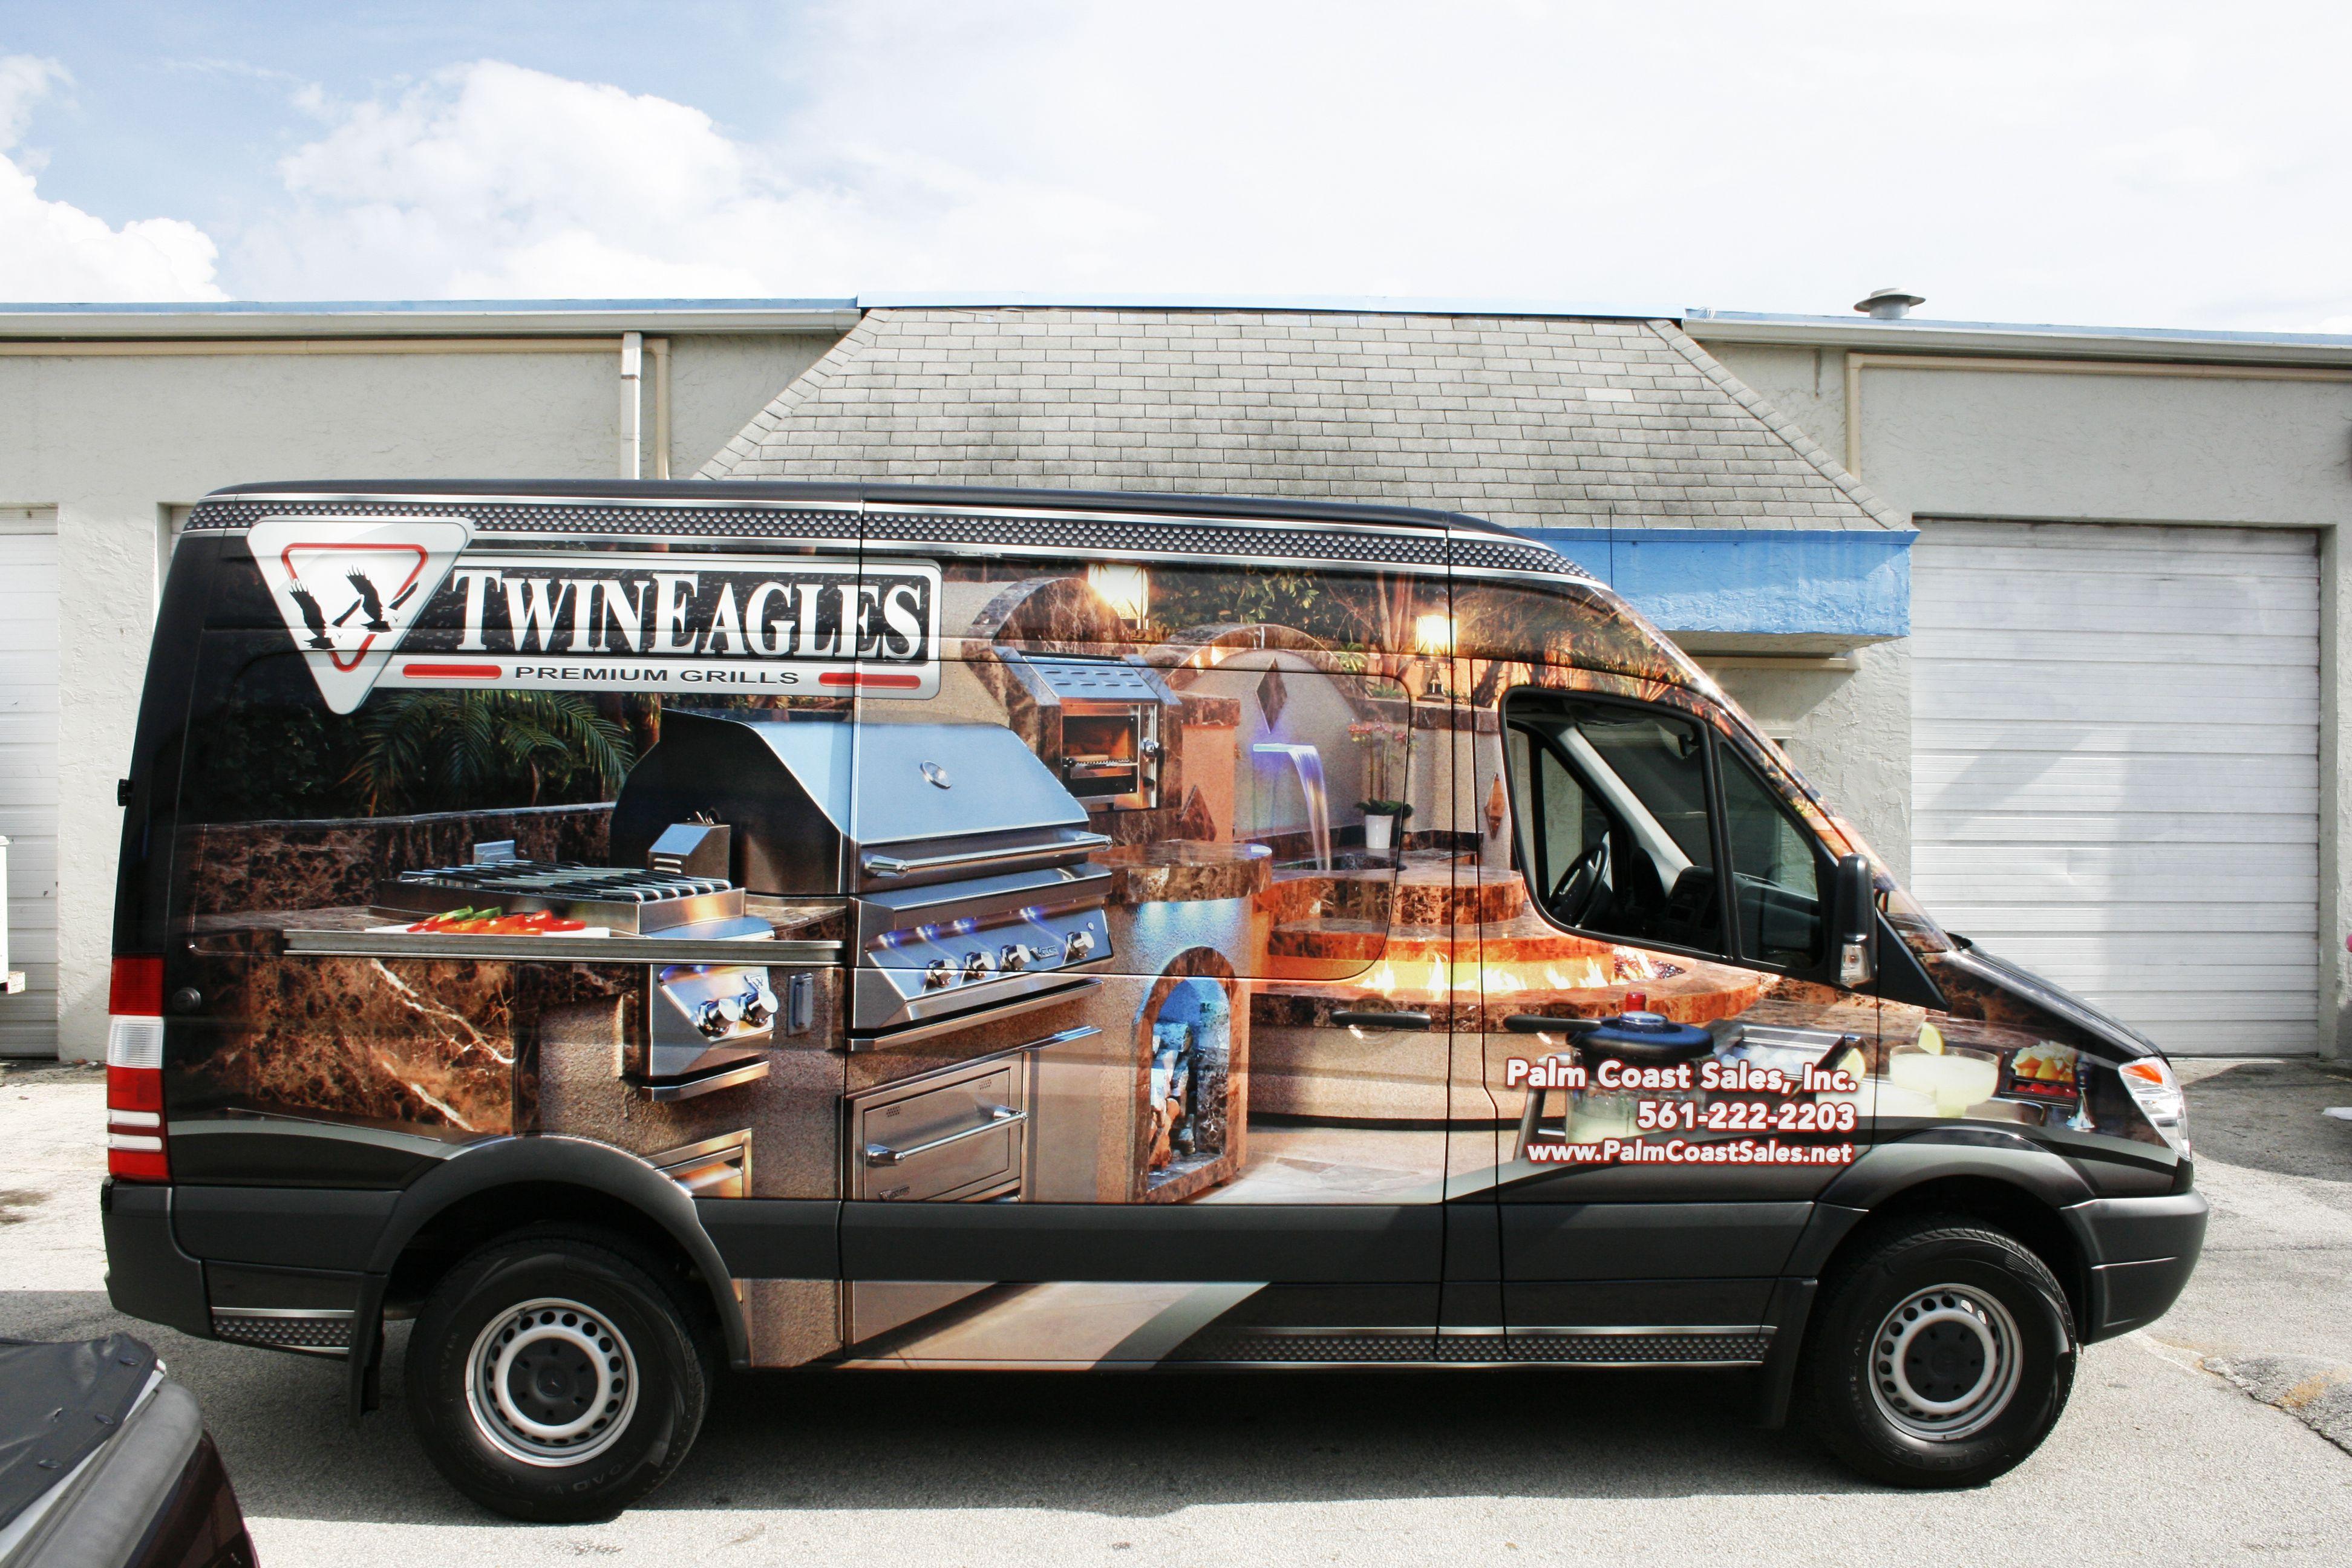 4628ccd3de Fort Lauderdale · Barbecue · Mercedes Sprinter 170 Van Vinyl Wrap Jupiter  Florida. Twin Eagles Barbecue and Palm Coast Sales